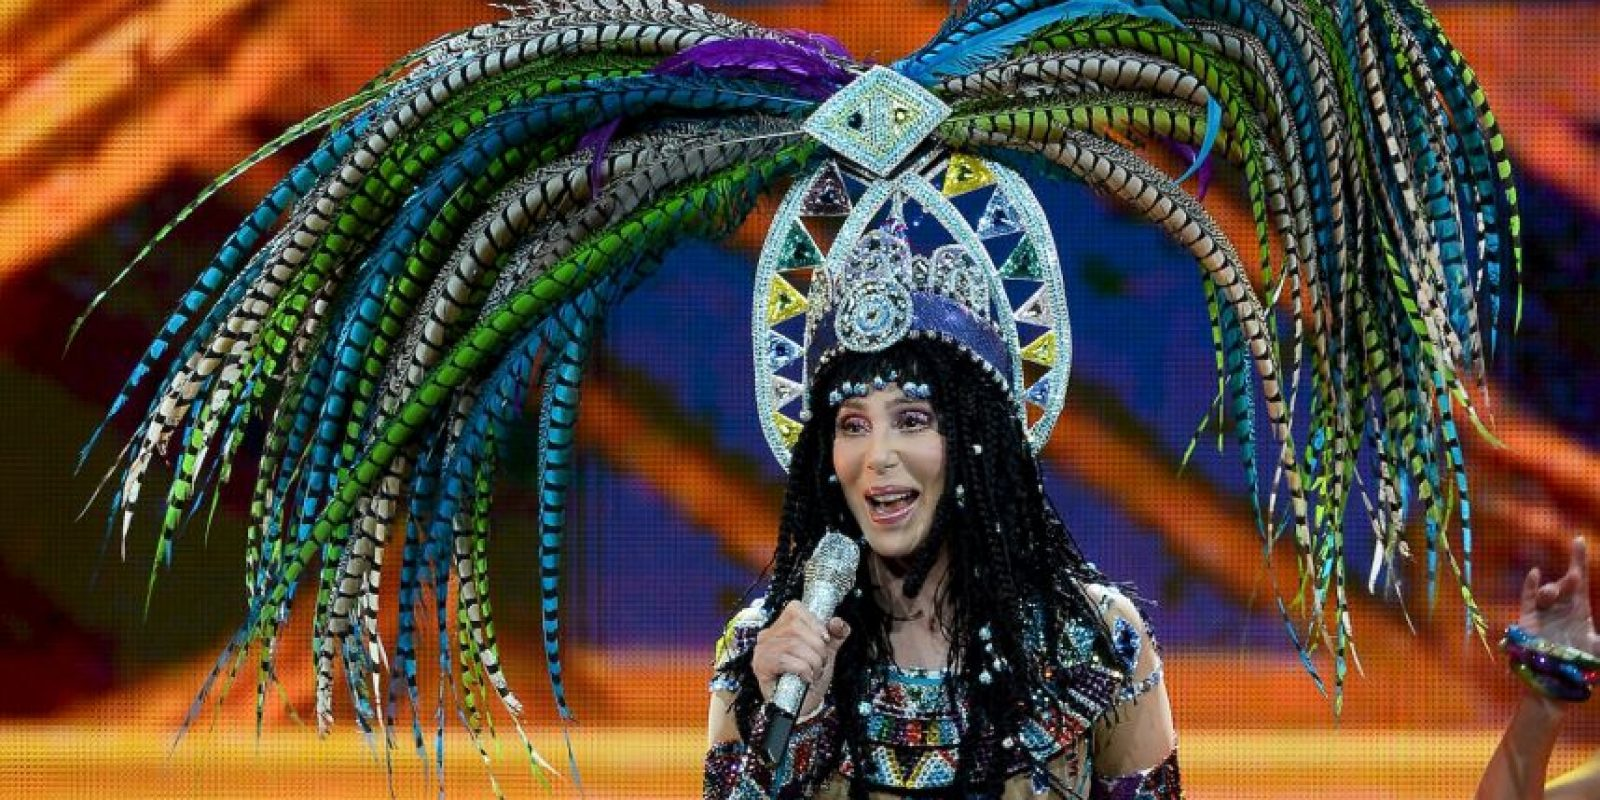 Cher tampoco se salvó de sus ofensas Foto:Getty Images